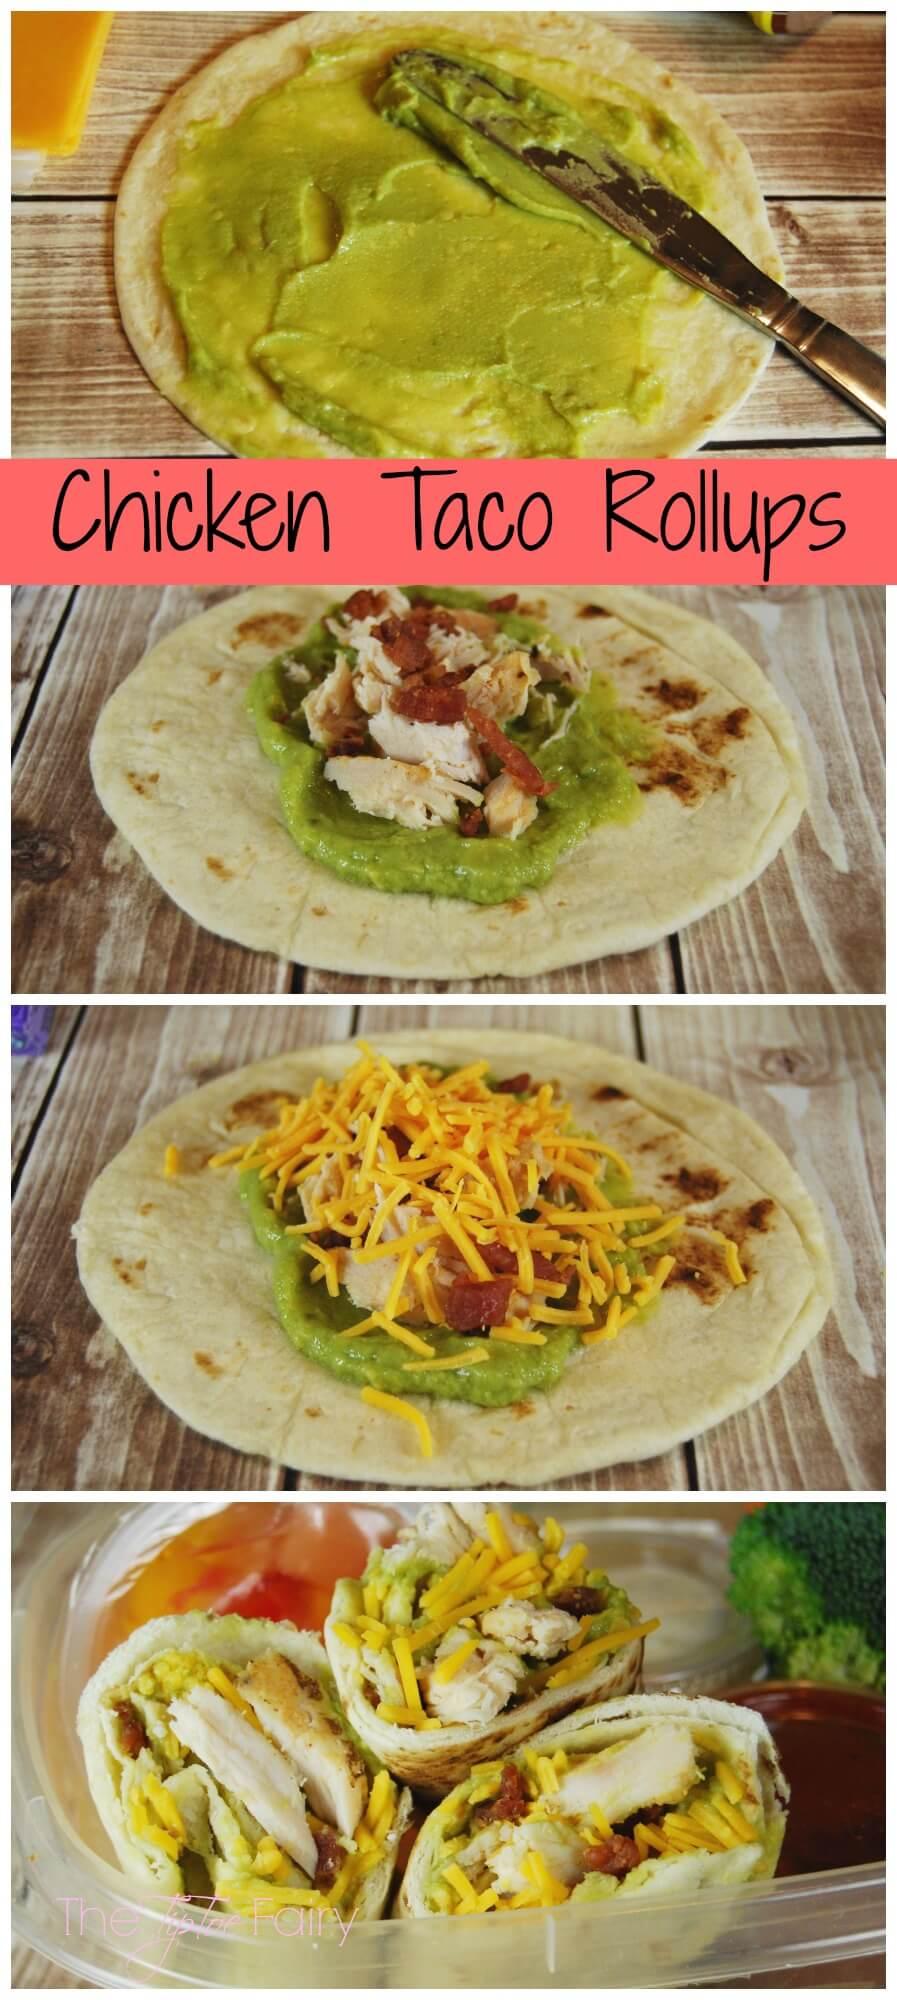 Lunch Box Ideas - Chicken Taco Roll Ups | The TipToe Fairy #MyGoodLife #shop #chickenrecipes #lunchboxideas #lunchideas